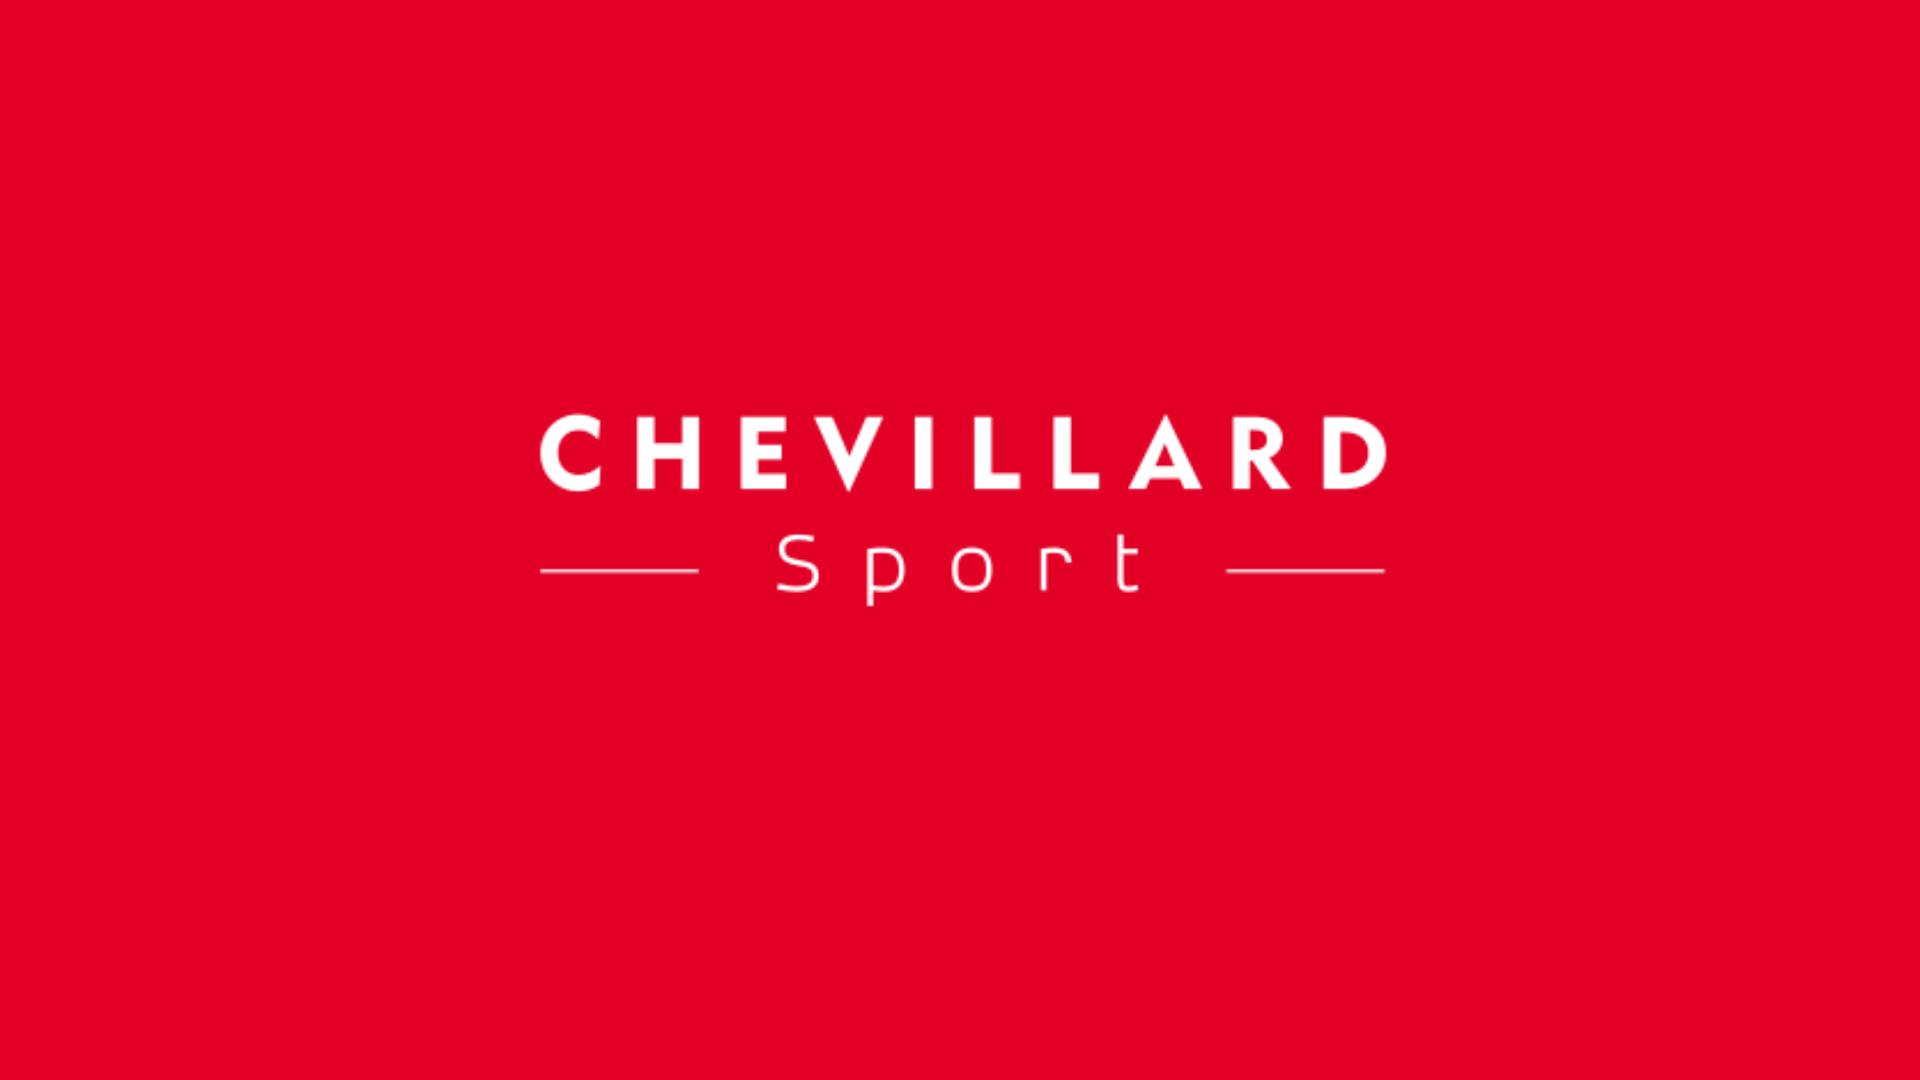 Chevillard Sport